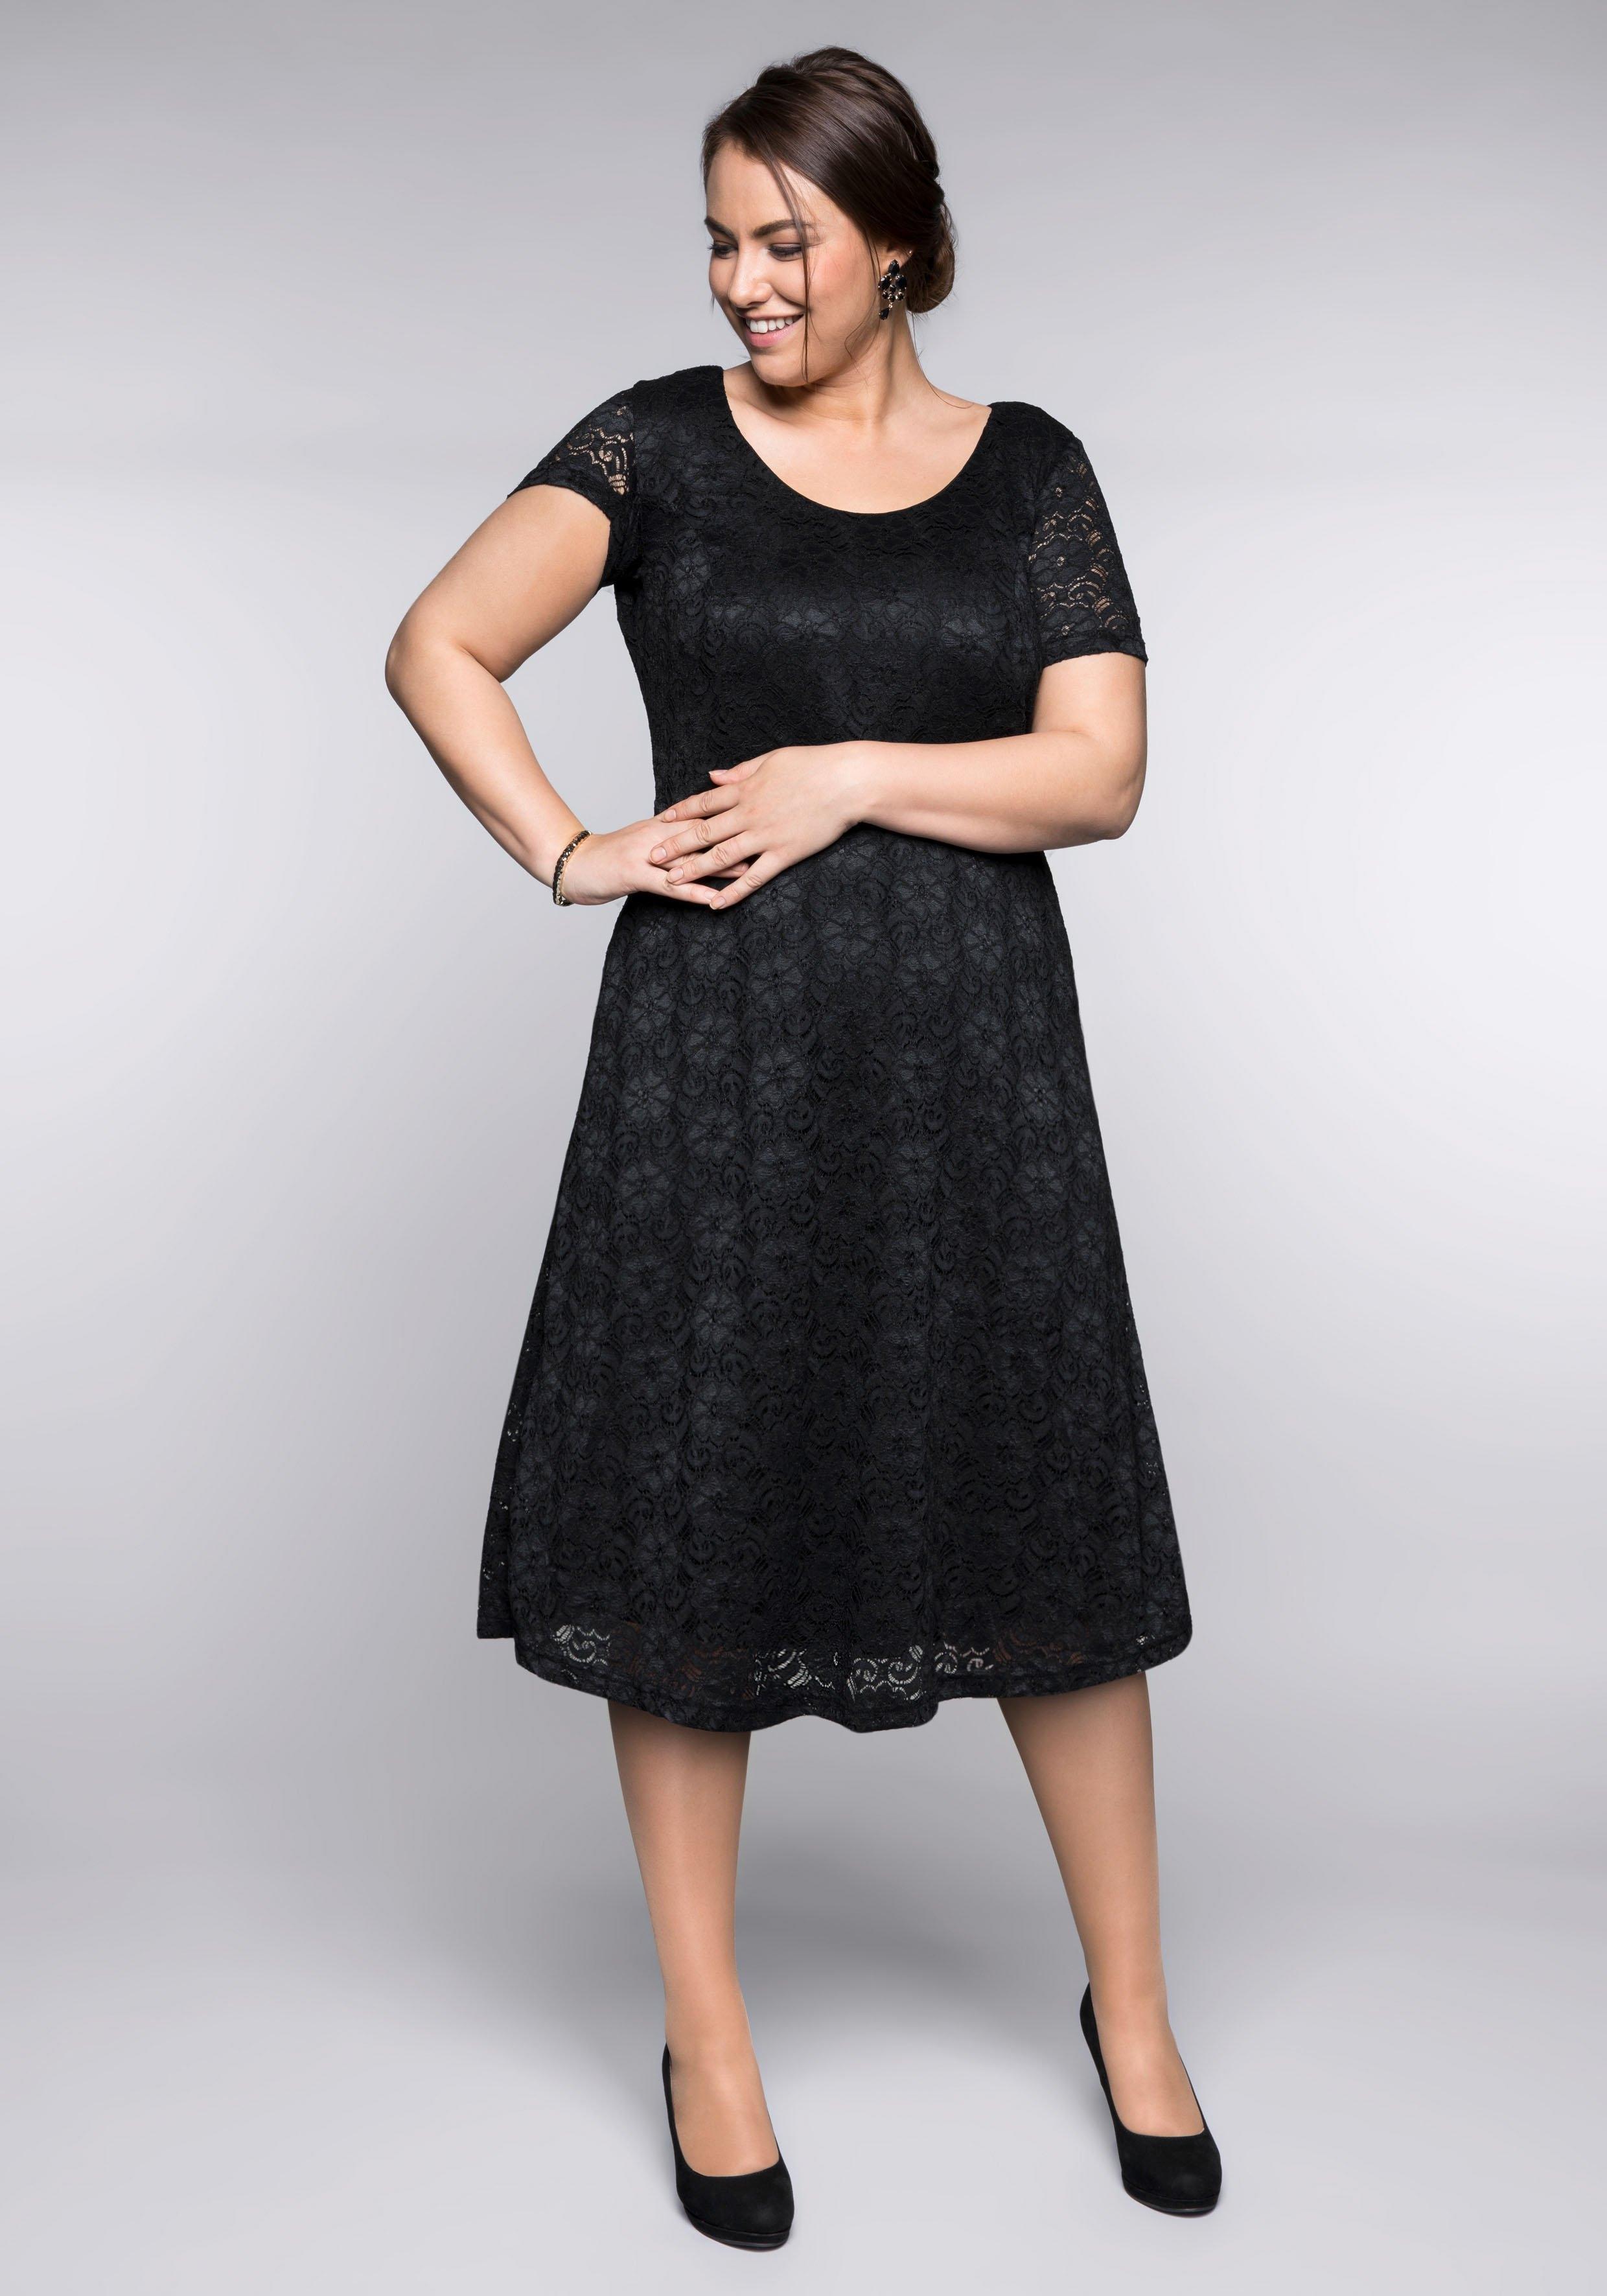 Sheego Style kanten jurk online kopen op otto.nl